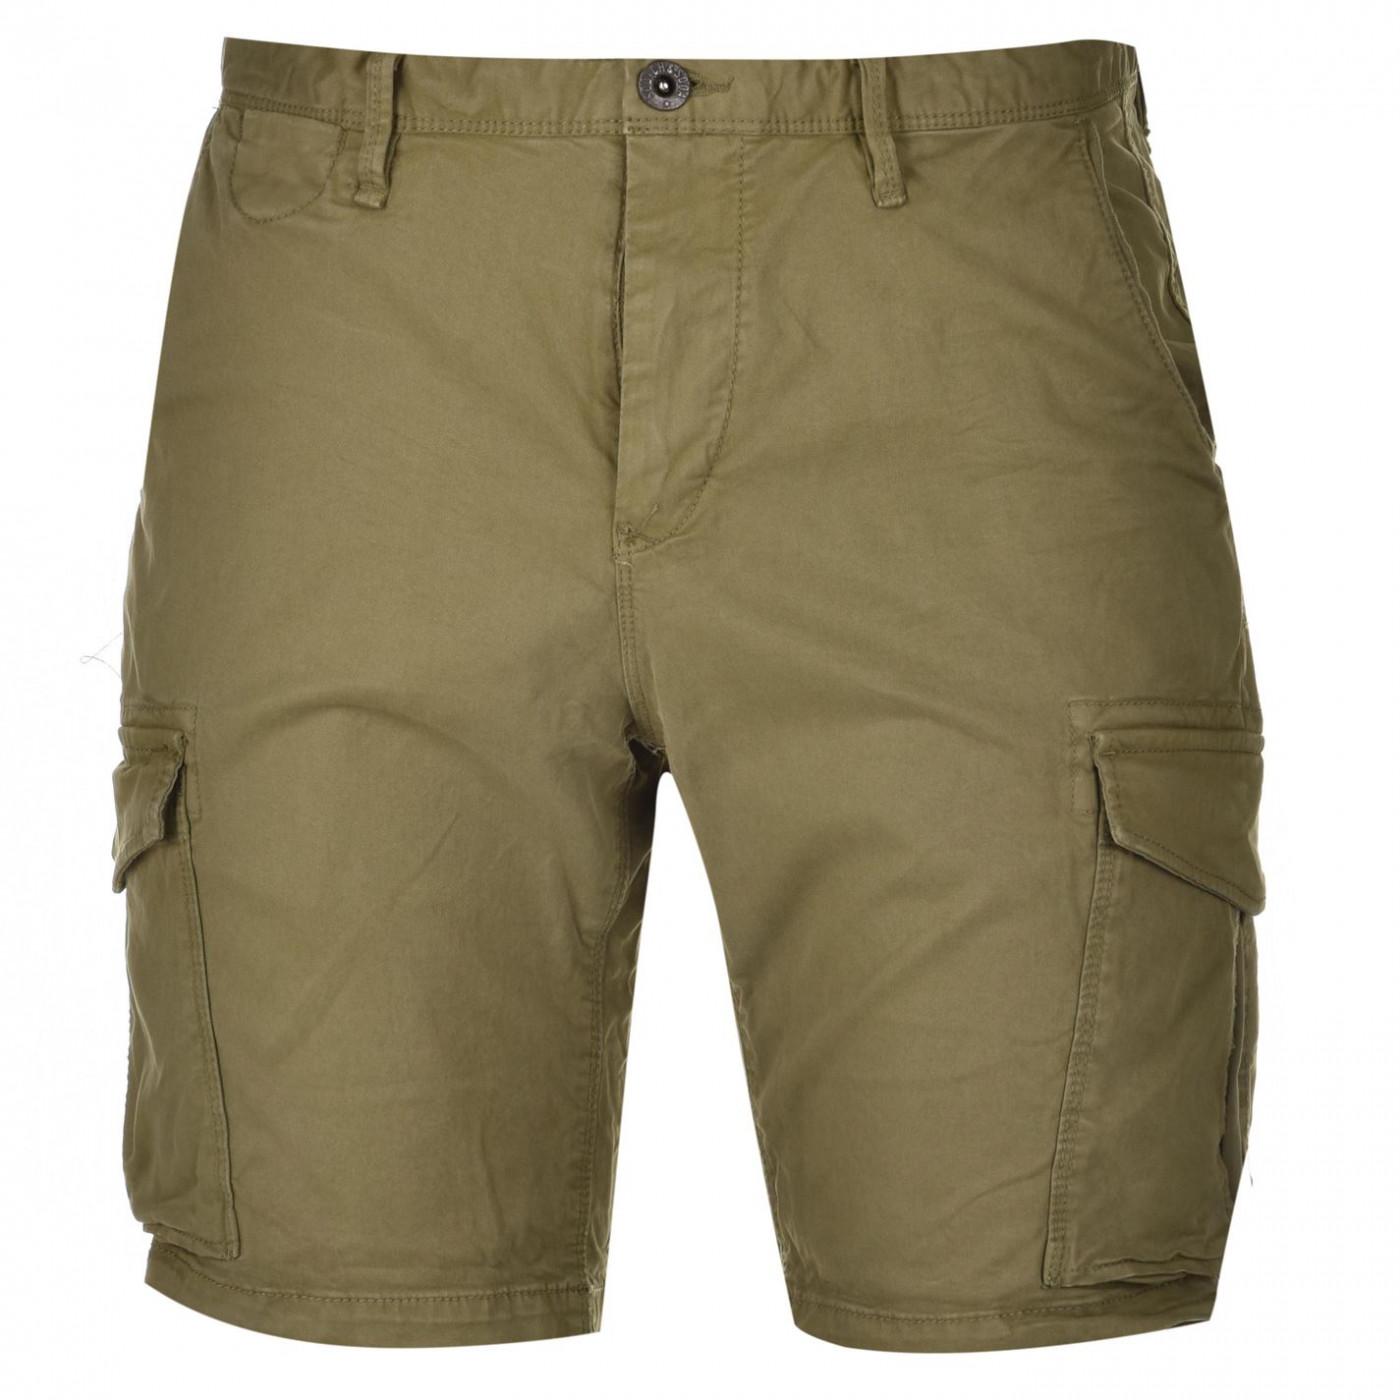 Scotch and Soda Cargo Shorts Mens